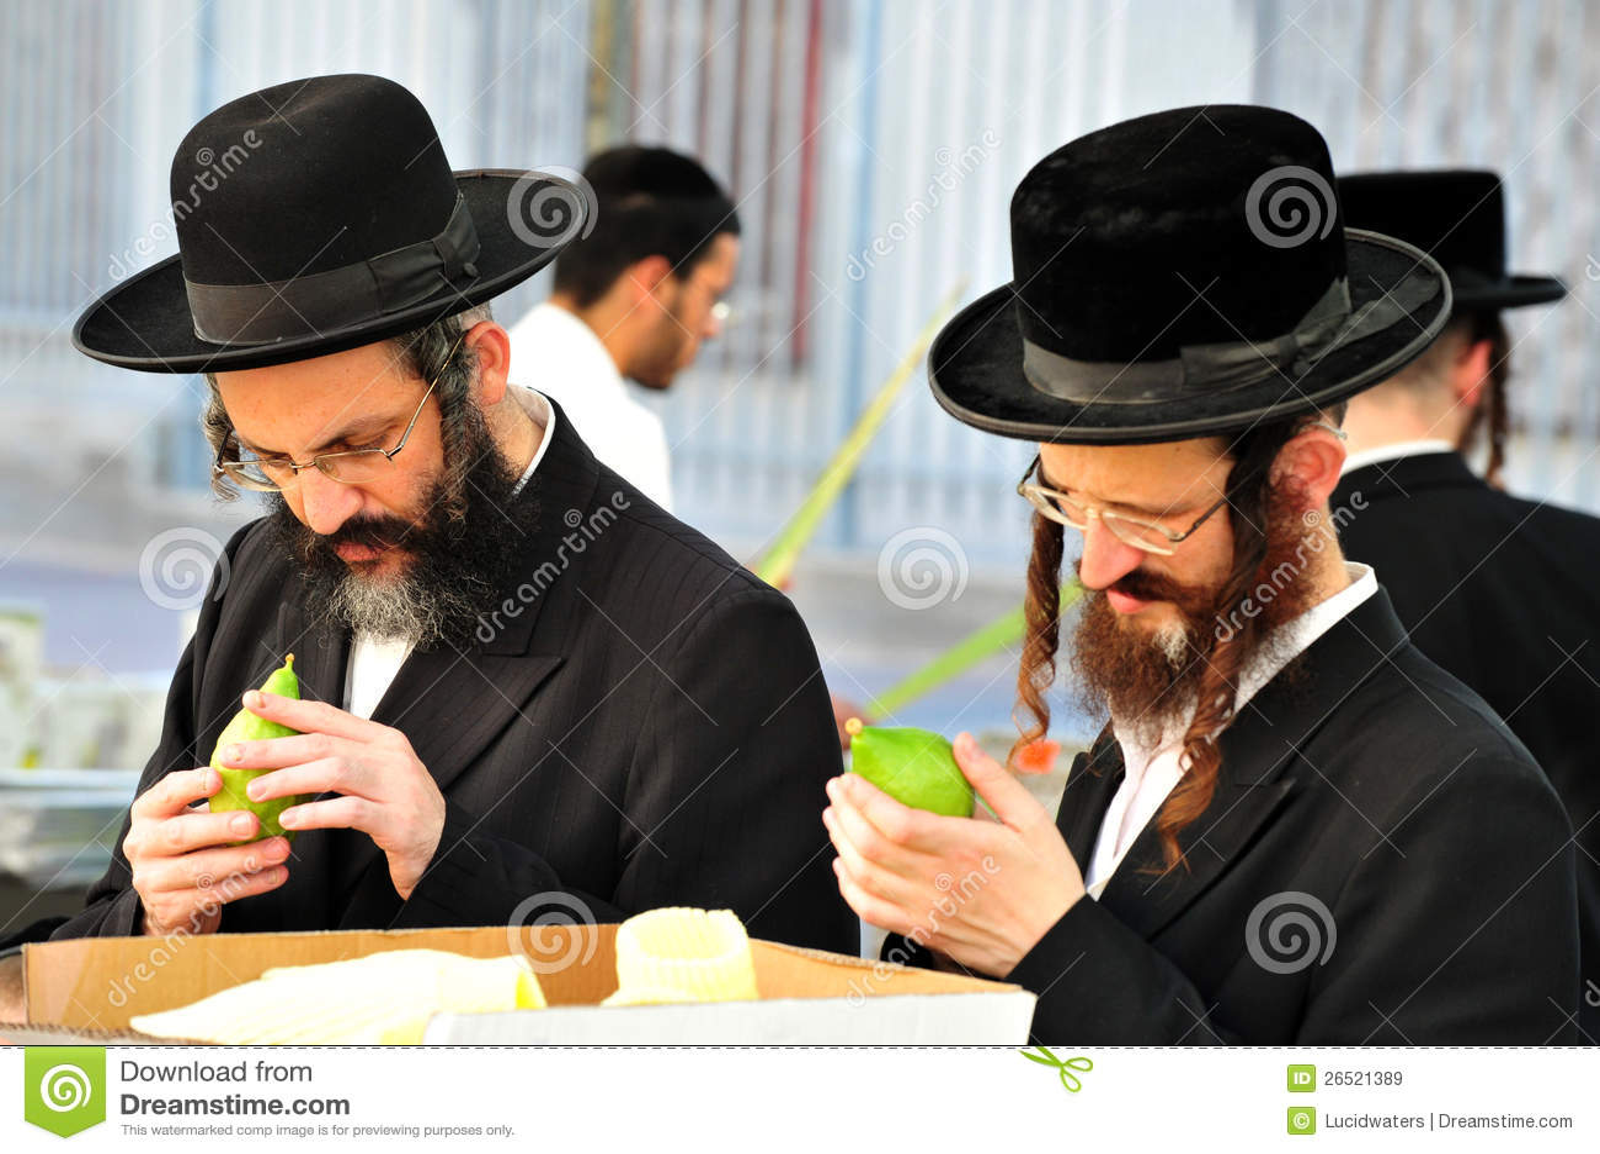 ... For Jewish Holiday Of Sukkot Editorial Stock Image - Image: 26521389